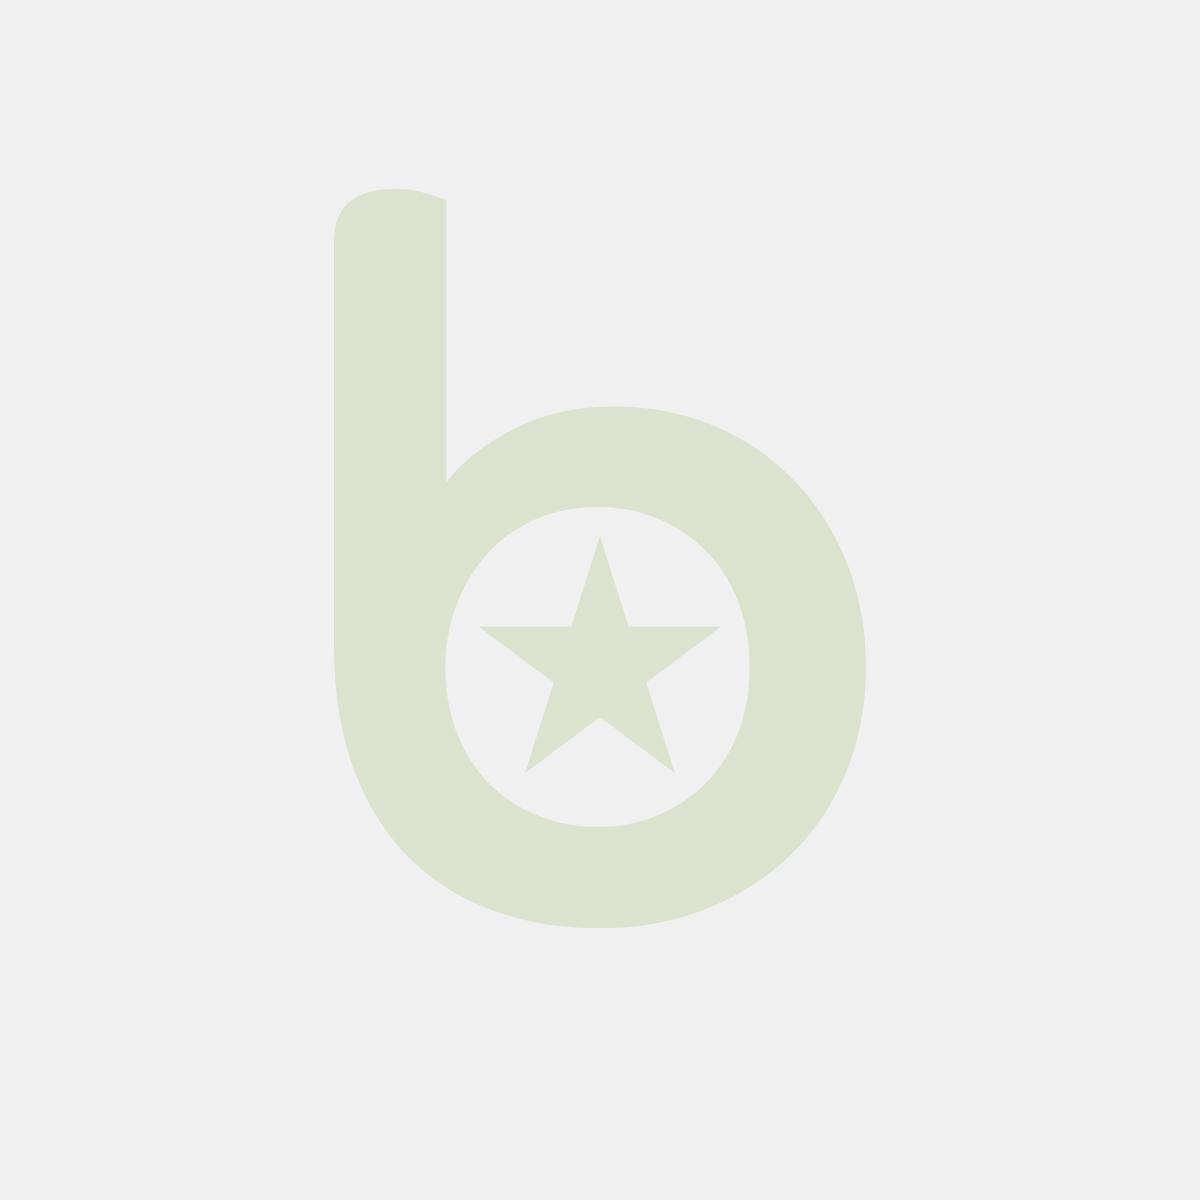 Patelnia WOK Profi Line aluminiowa powlekana tytanem kod 839010